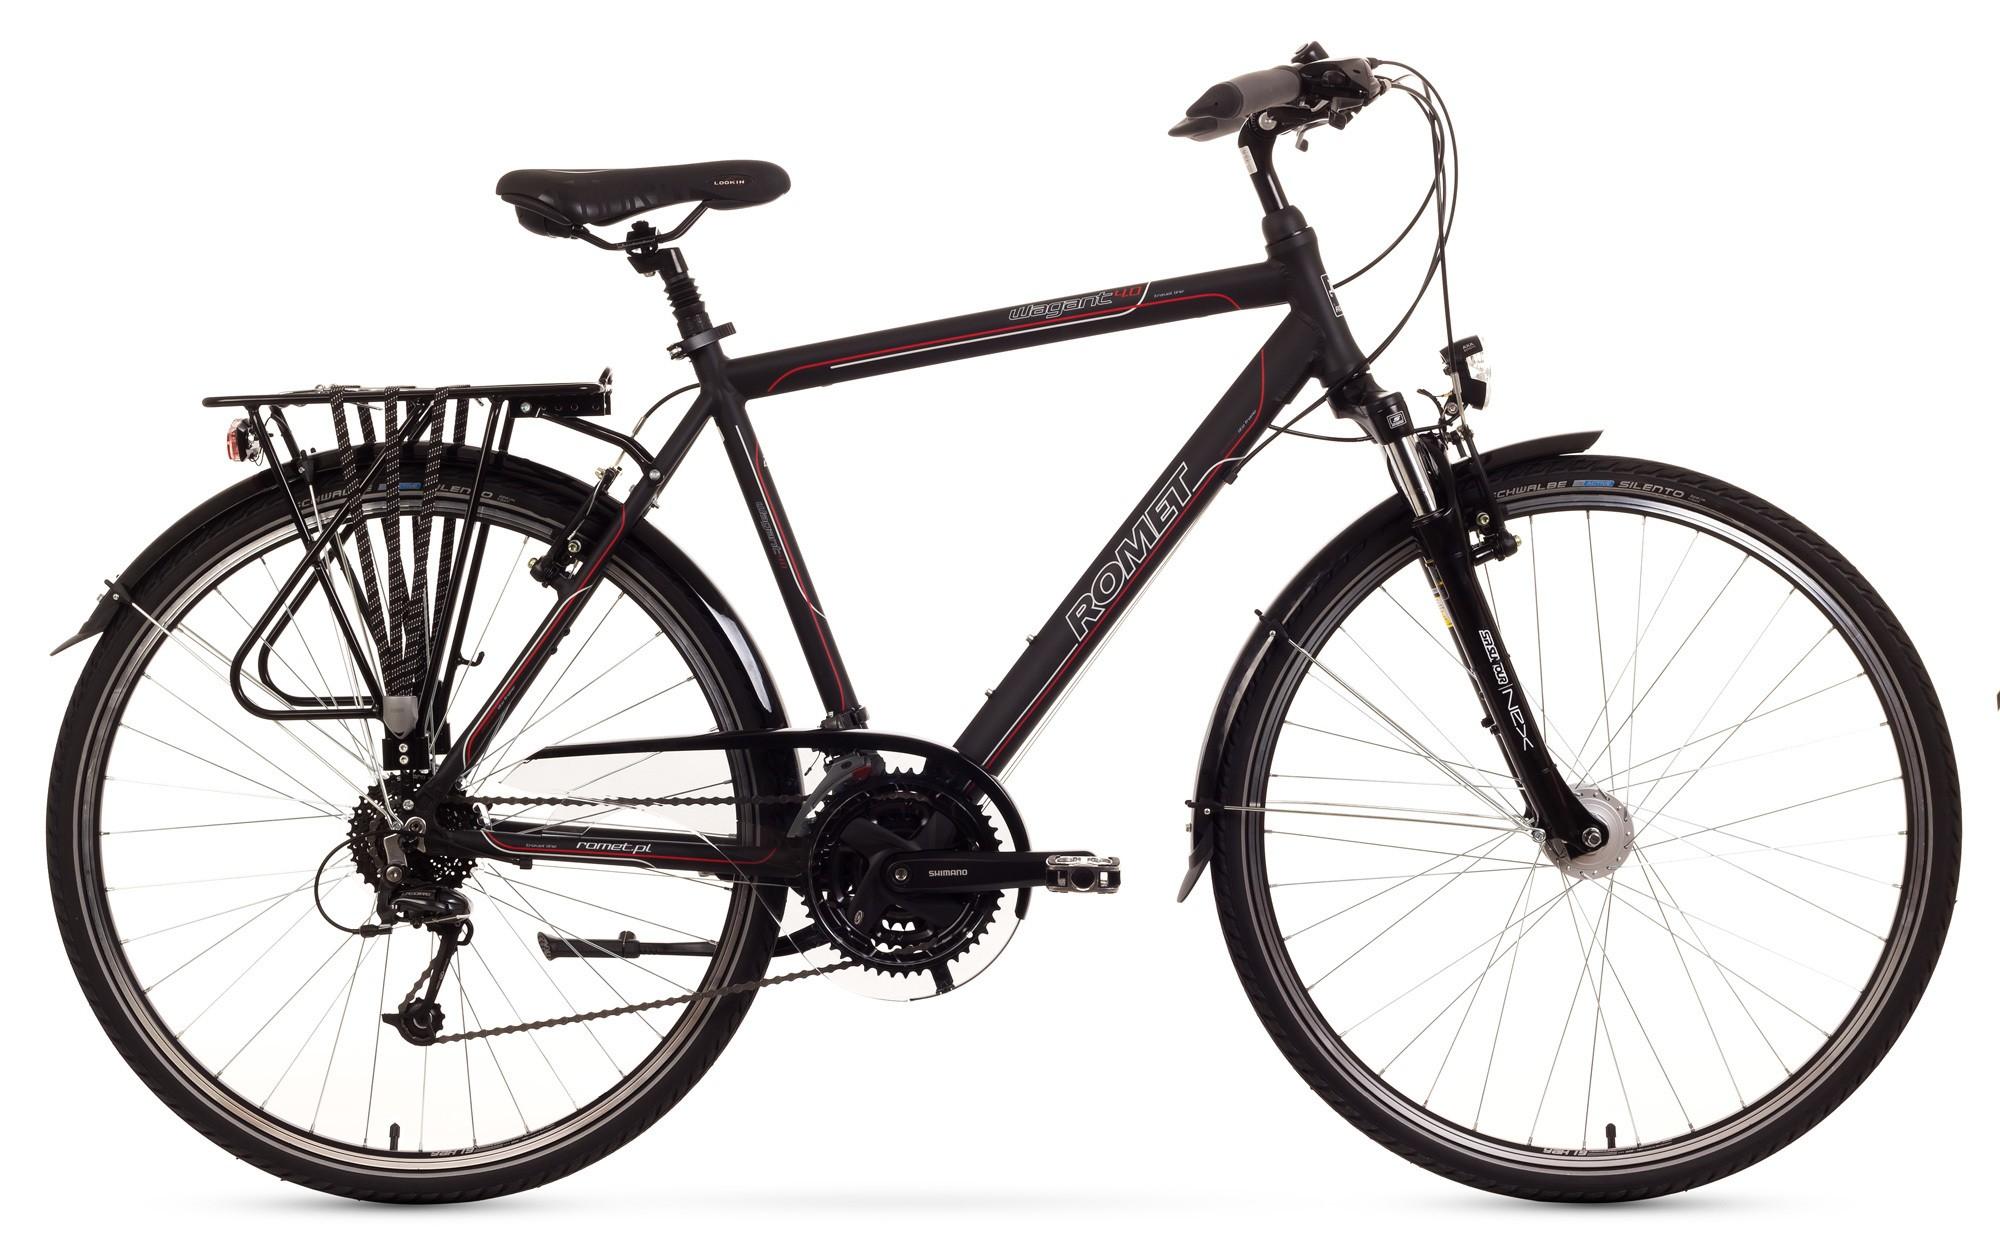 Bicicleta Trekking Romet Wagant 4.0 - negru